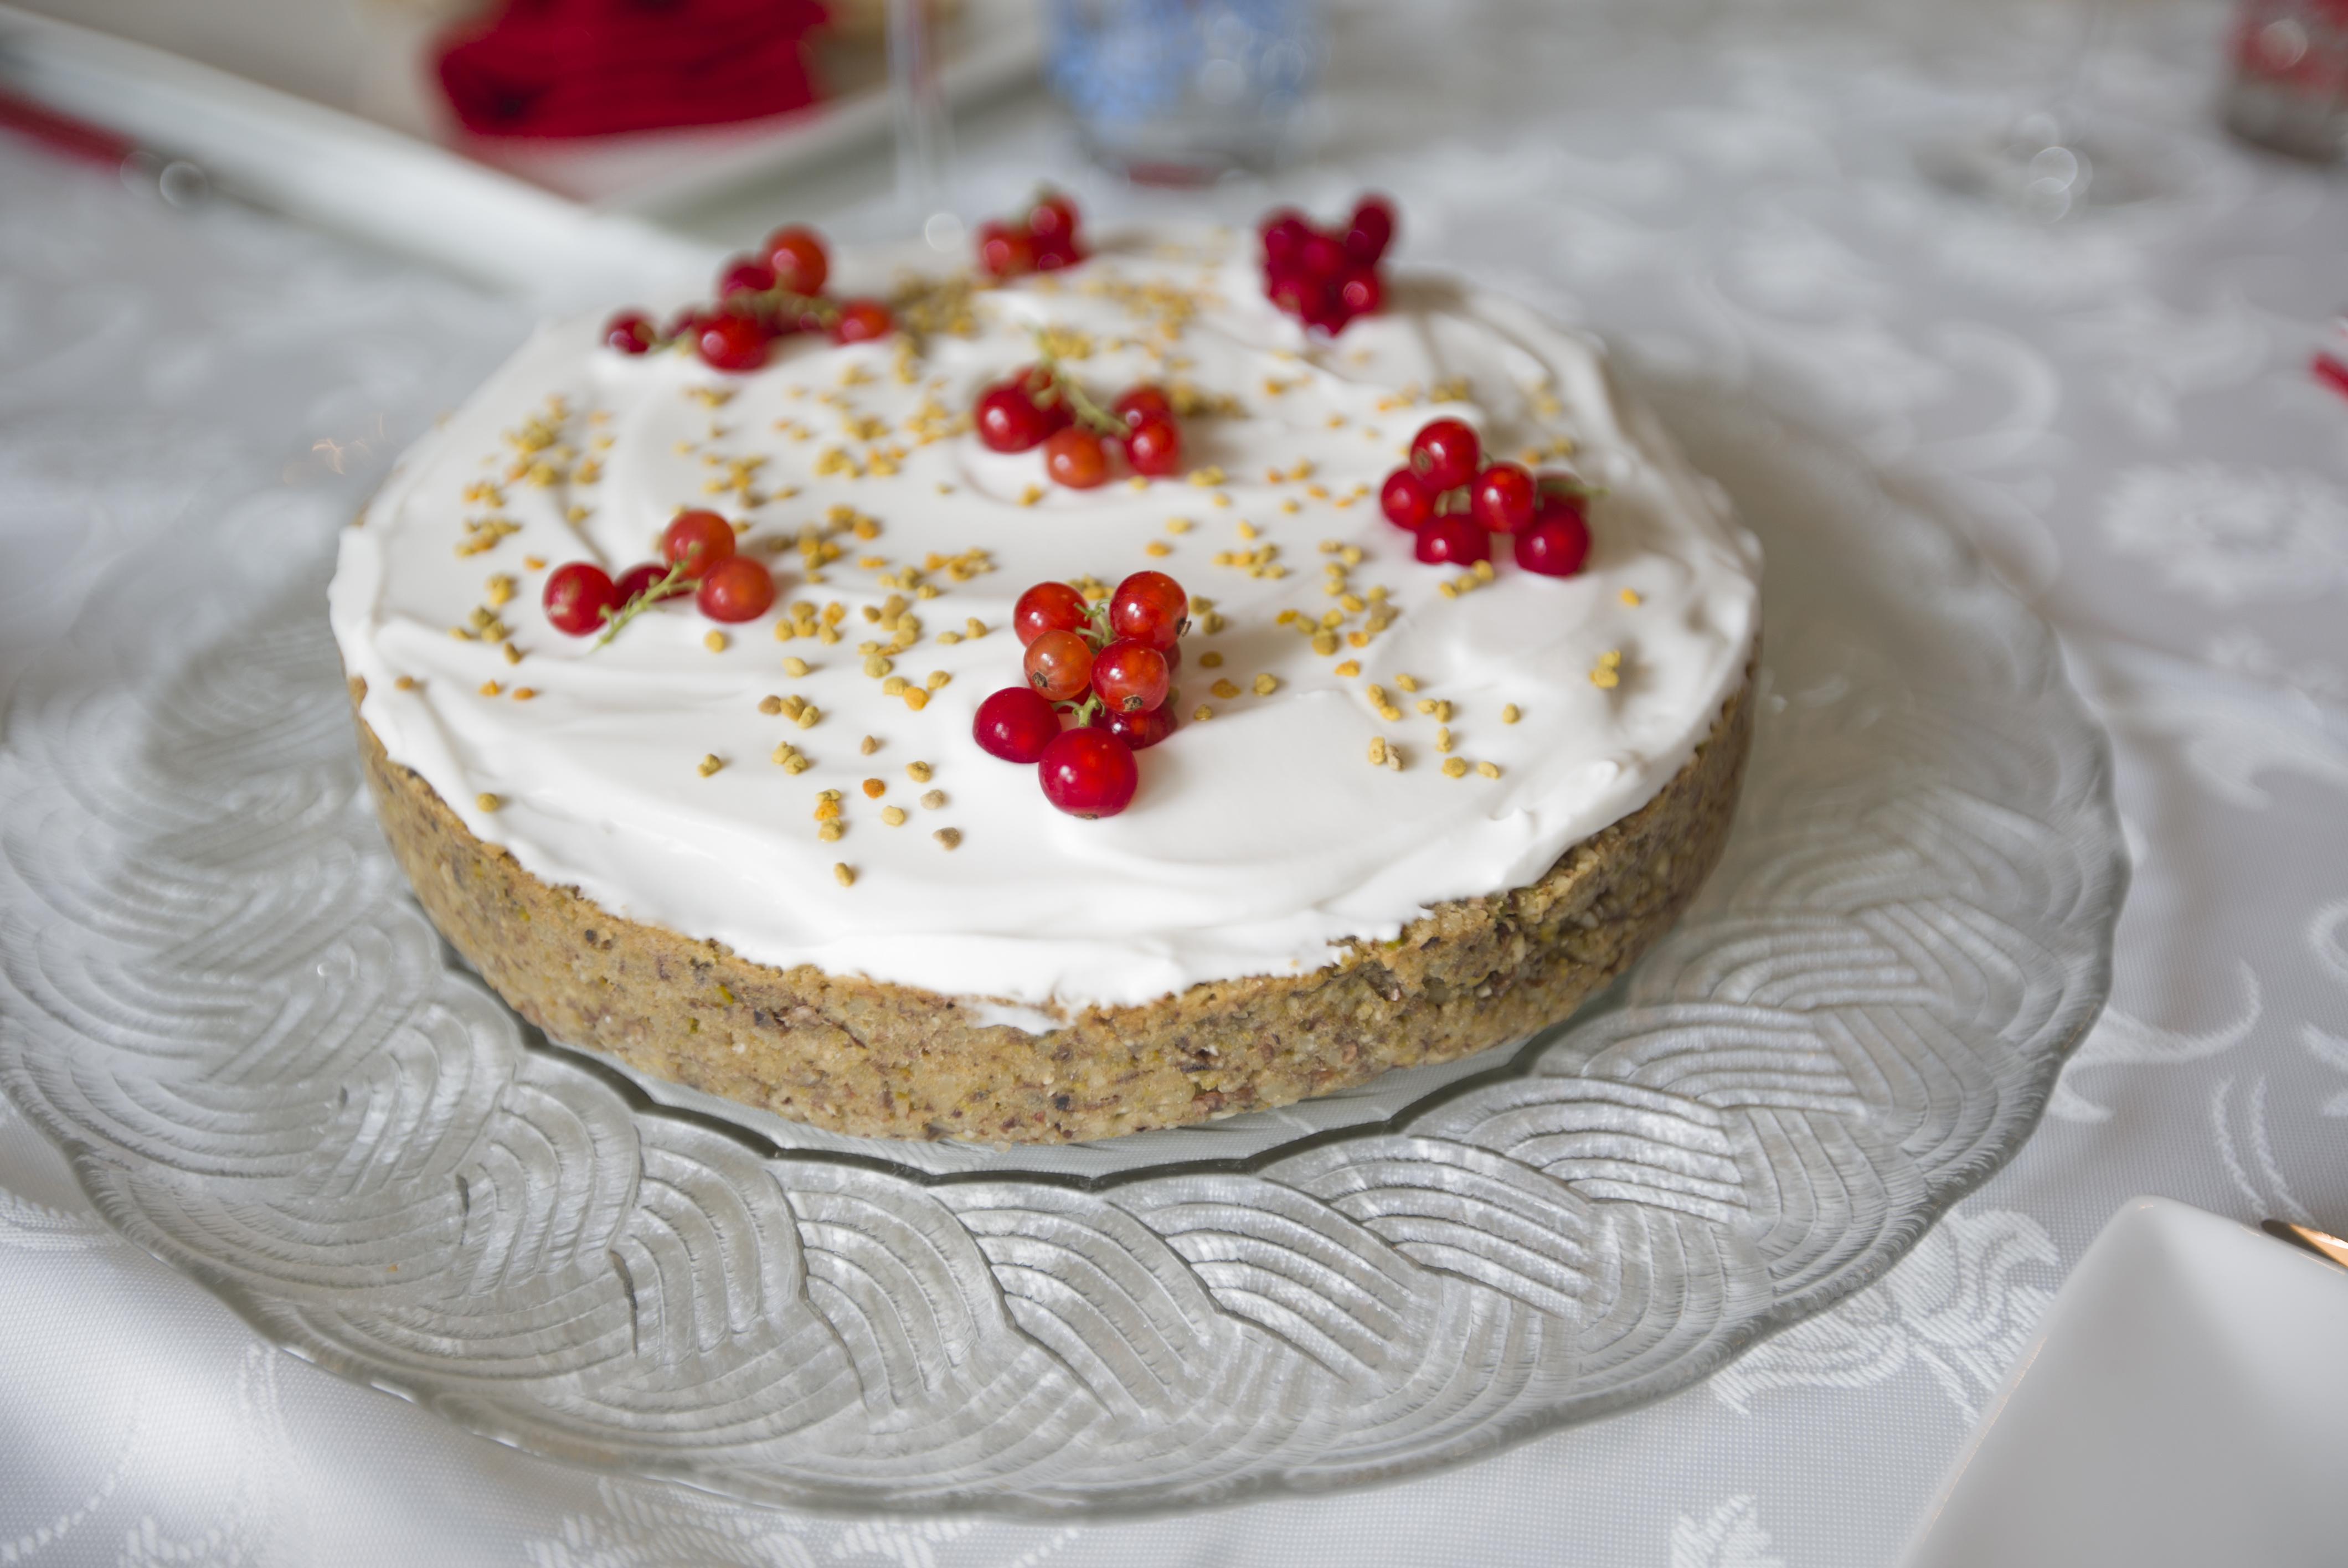 Turkish Pistachio & Almond Cake